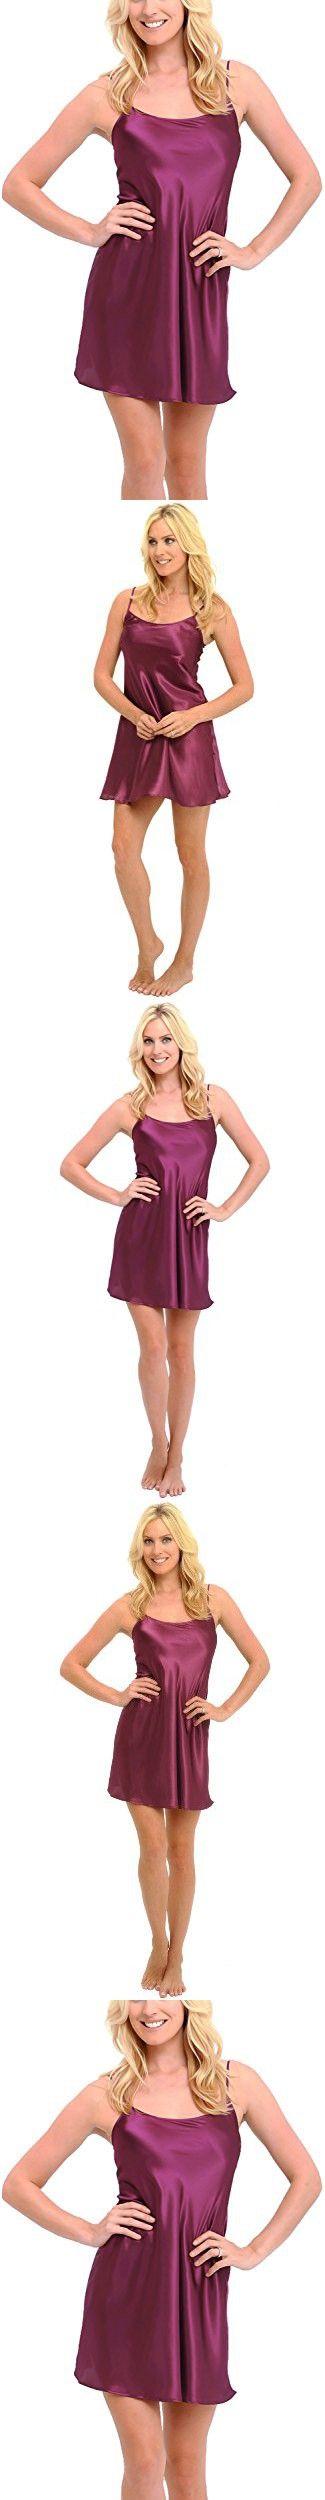 Del Rossa Women's Satin Nightgown, Long Camisole Chemise, Medium Deep Purple (A0766DPUMD)